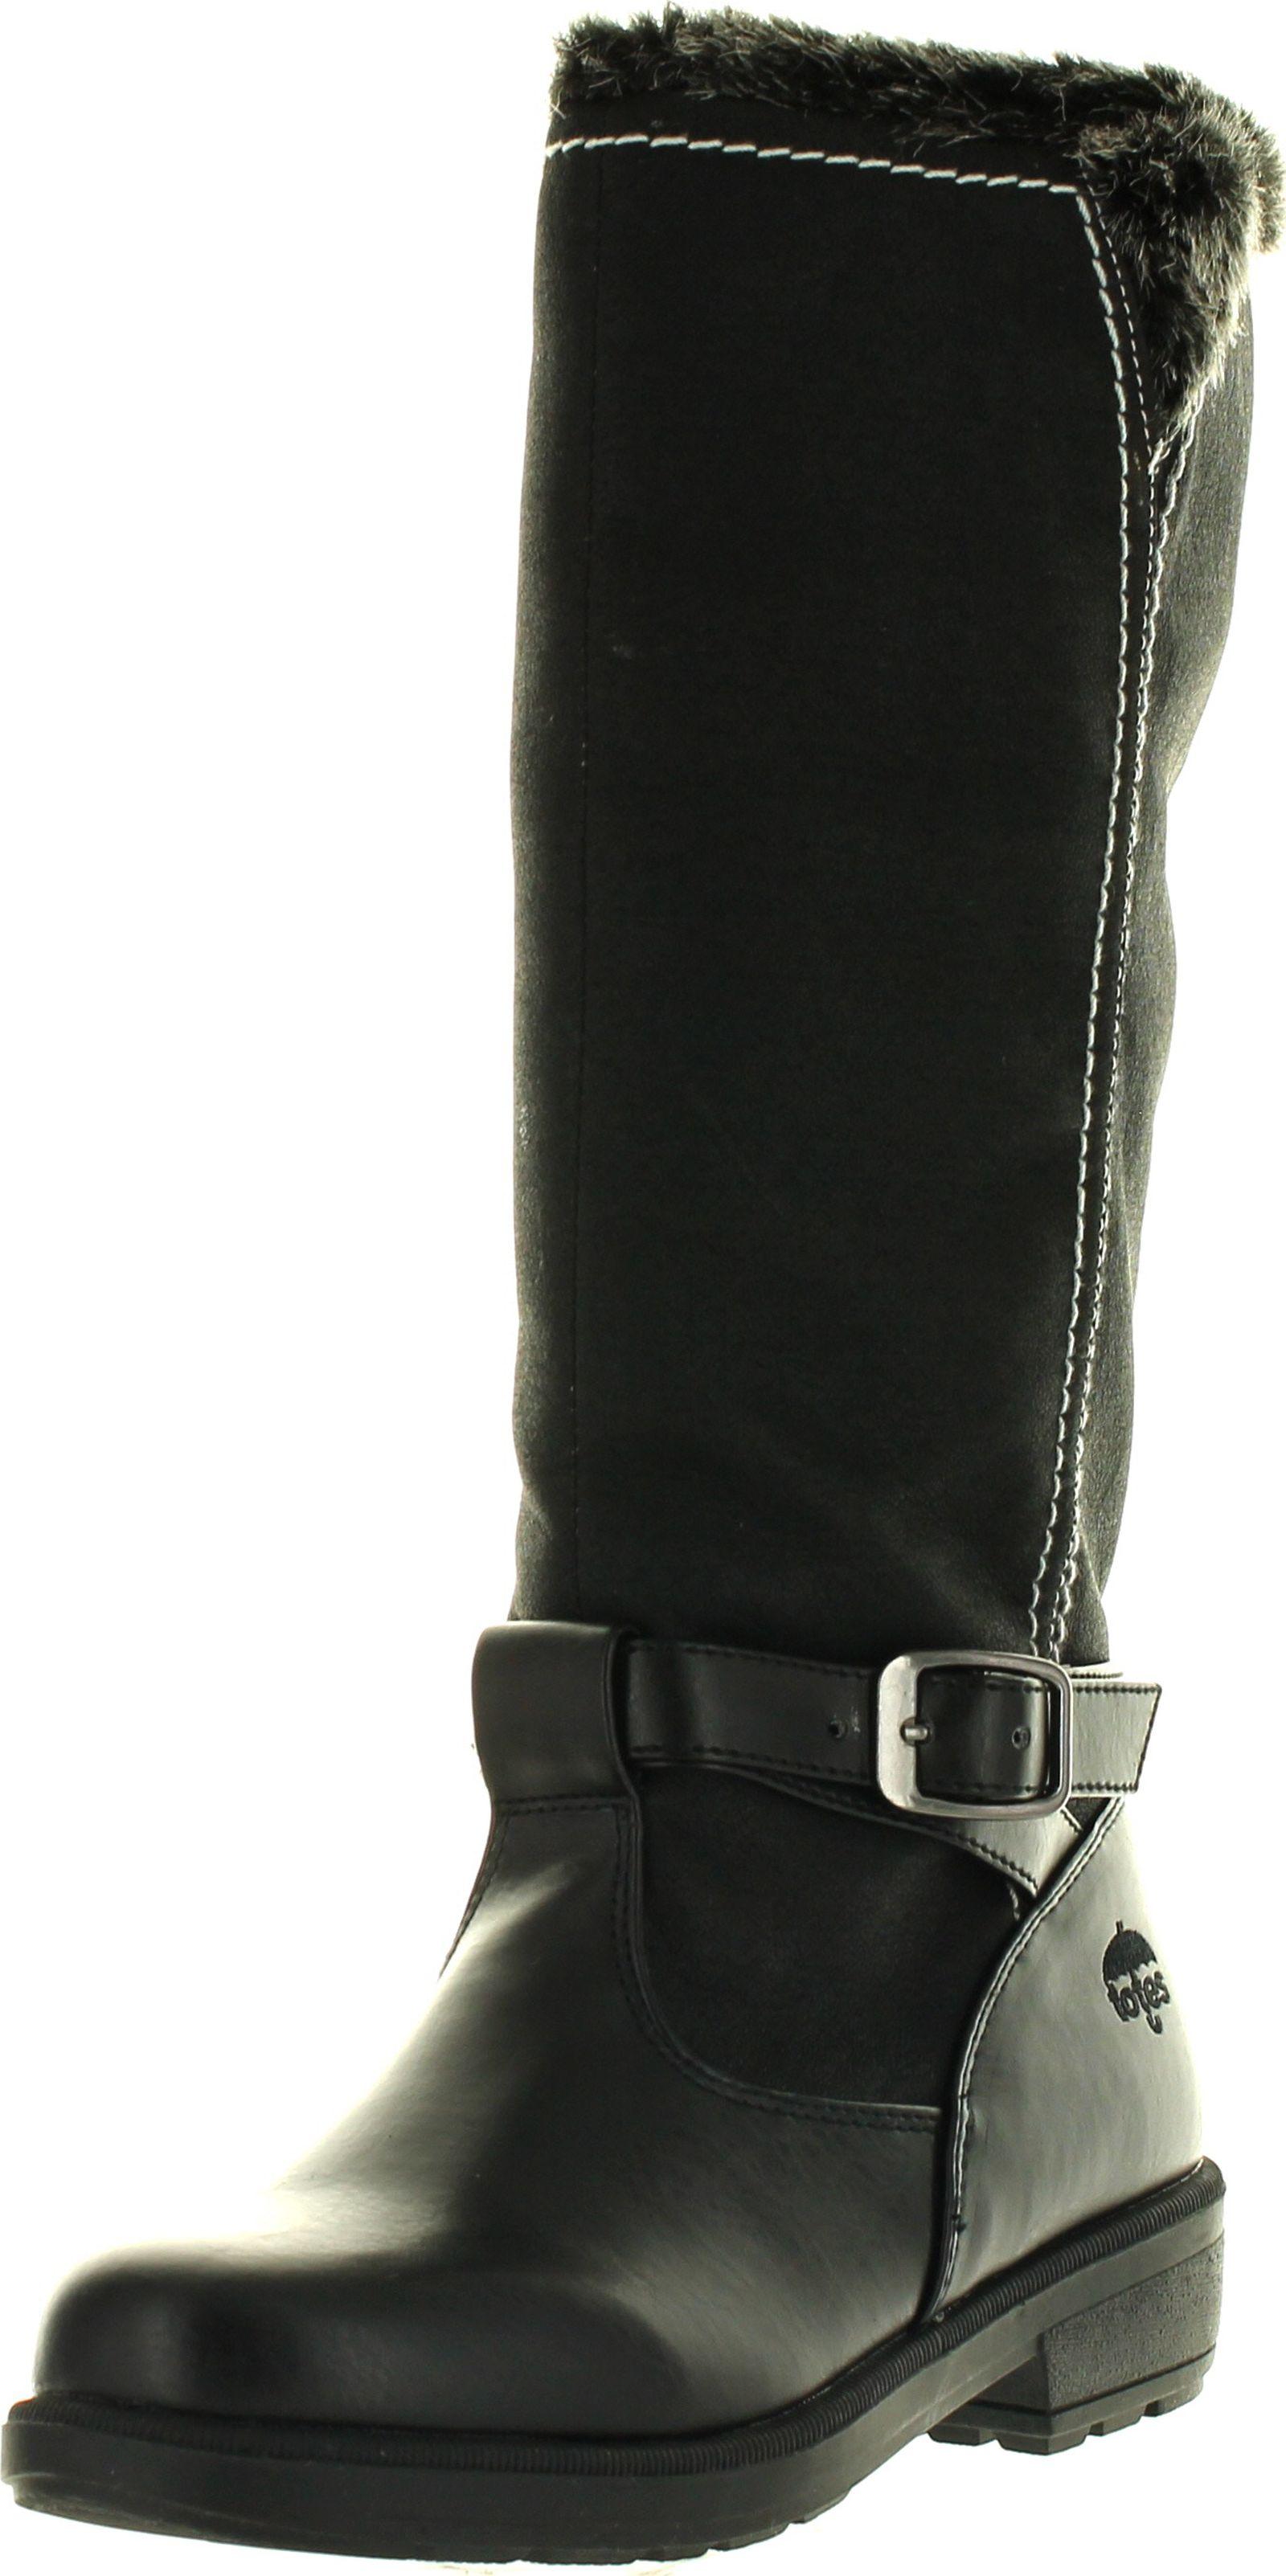 Luxury Bonnibel BA14 Womenu0026#39;s Two Tone Lace Up Combat Style Trendy Waterproof Duck Boots | EBay